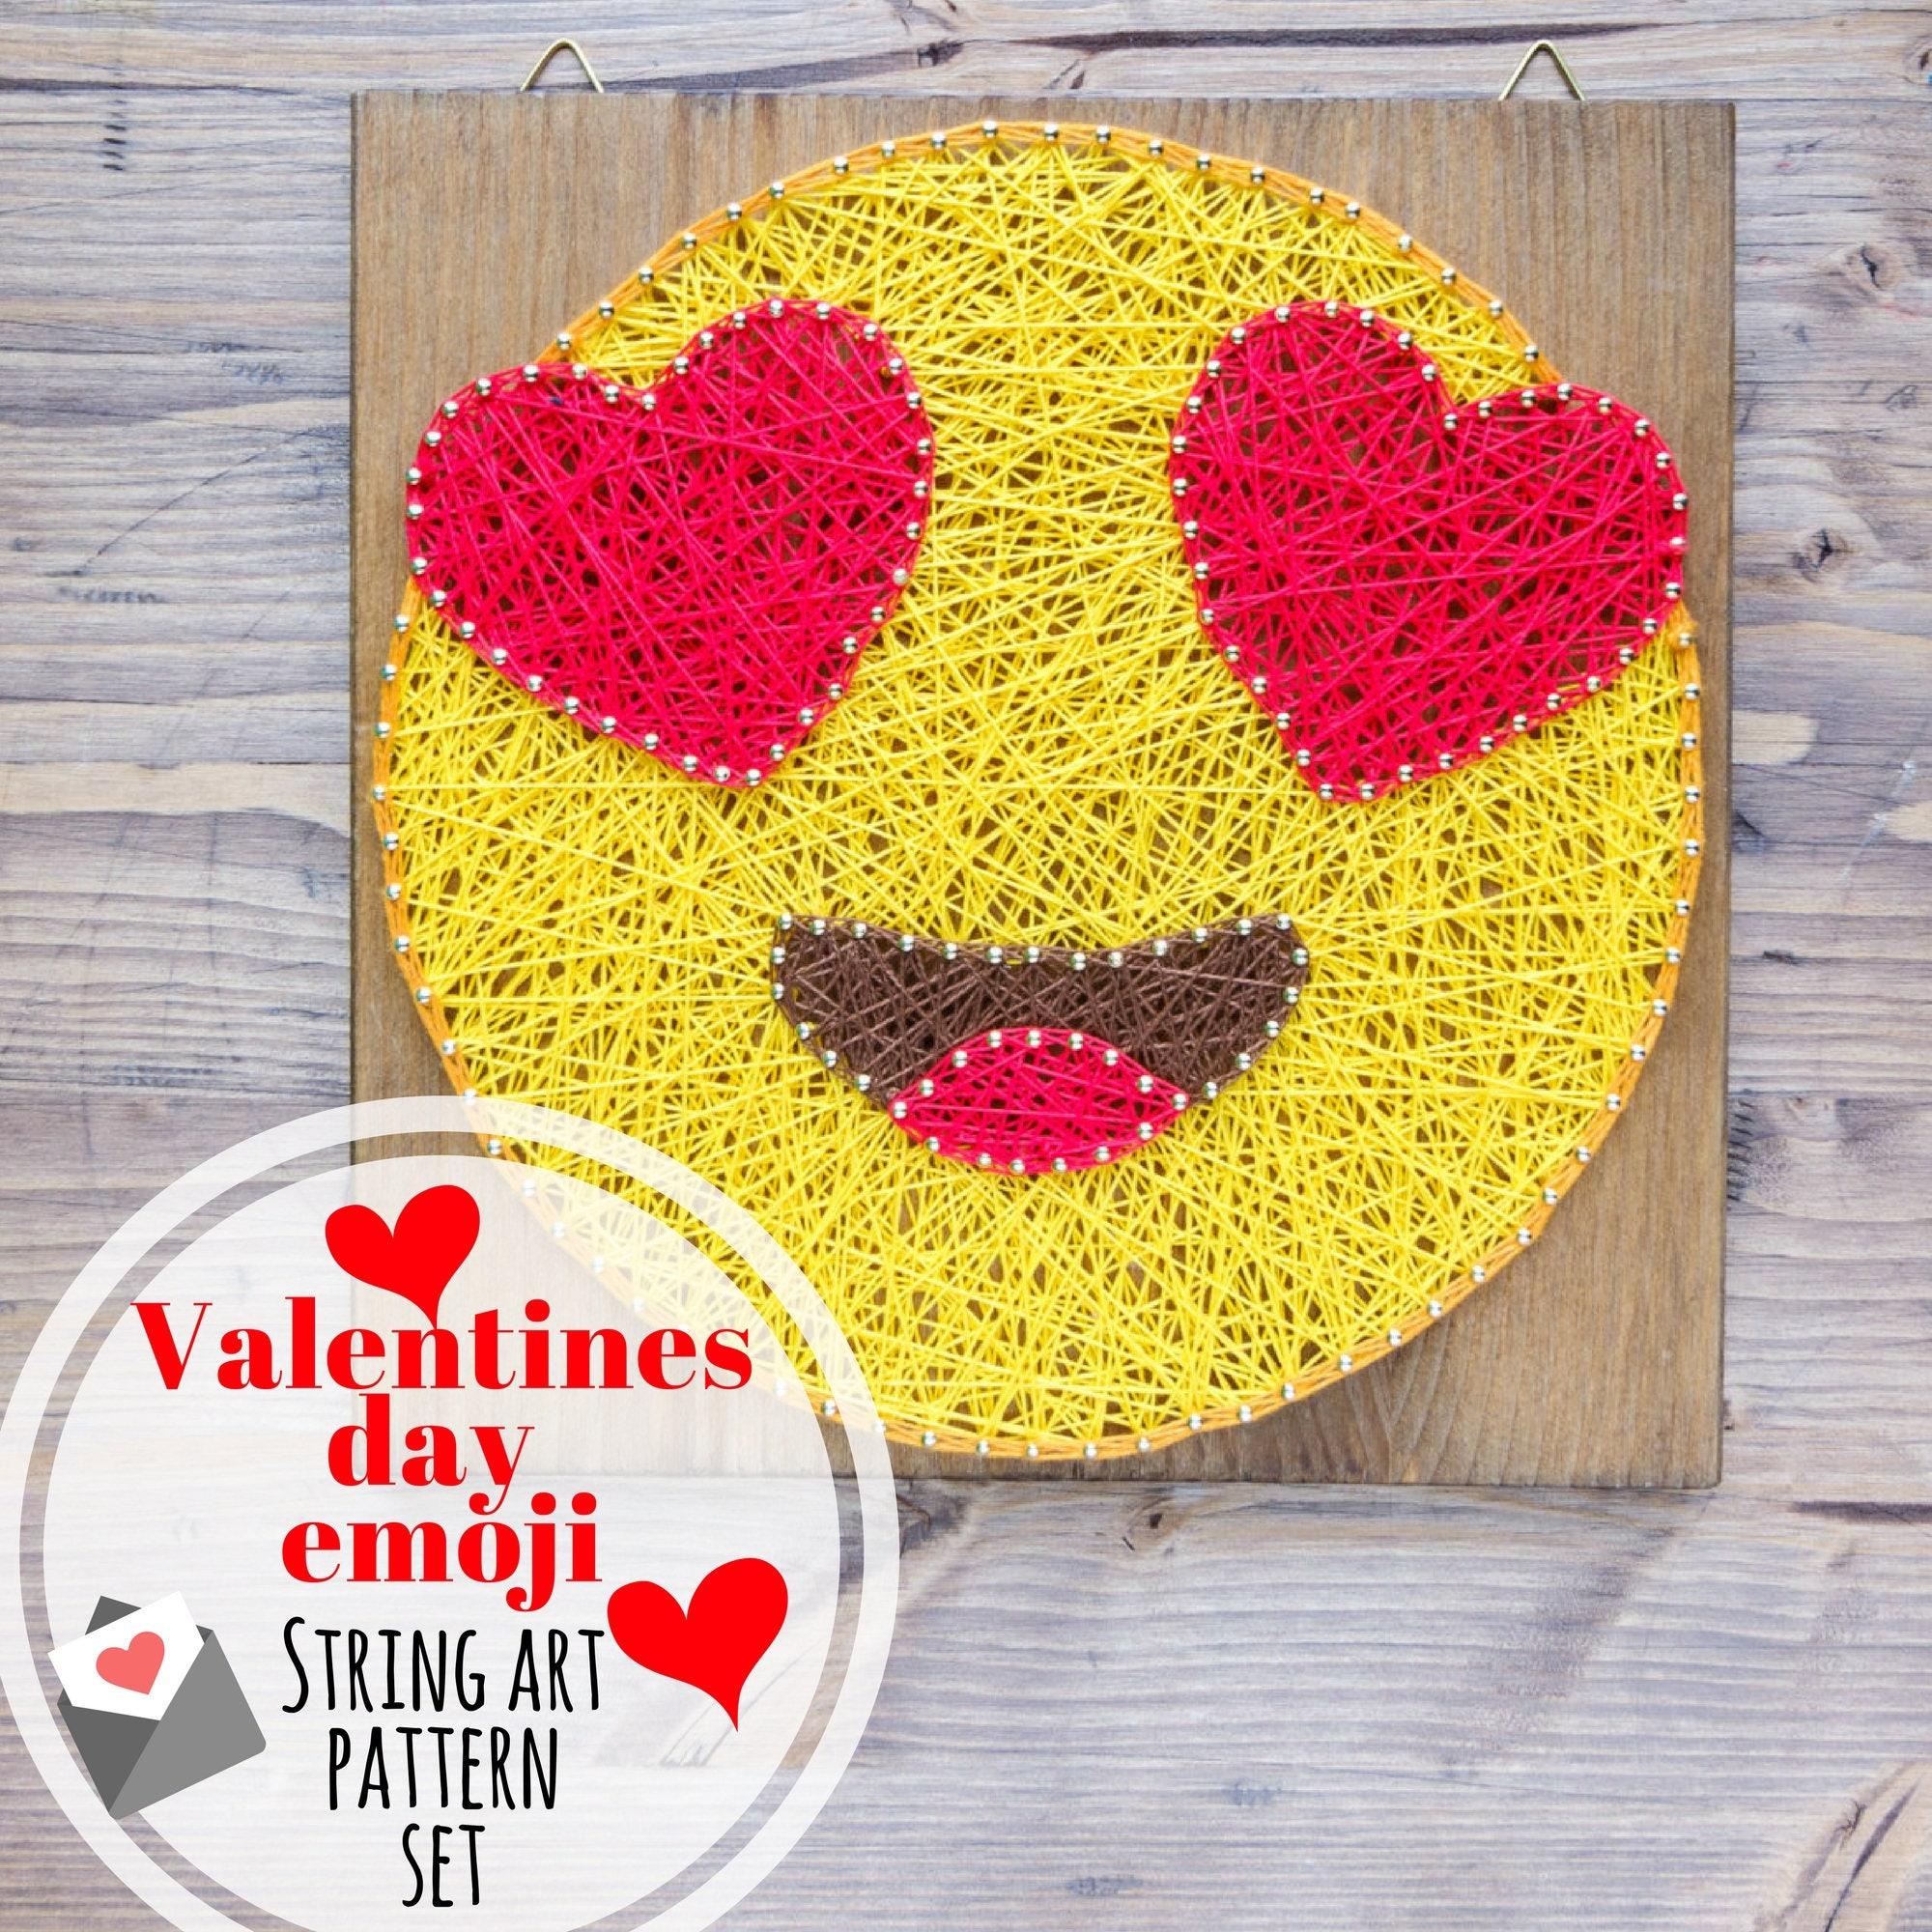 Valentines day emoji string art pattern set, in-love emoji, kiss ...